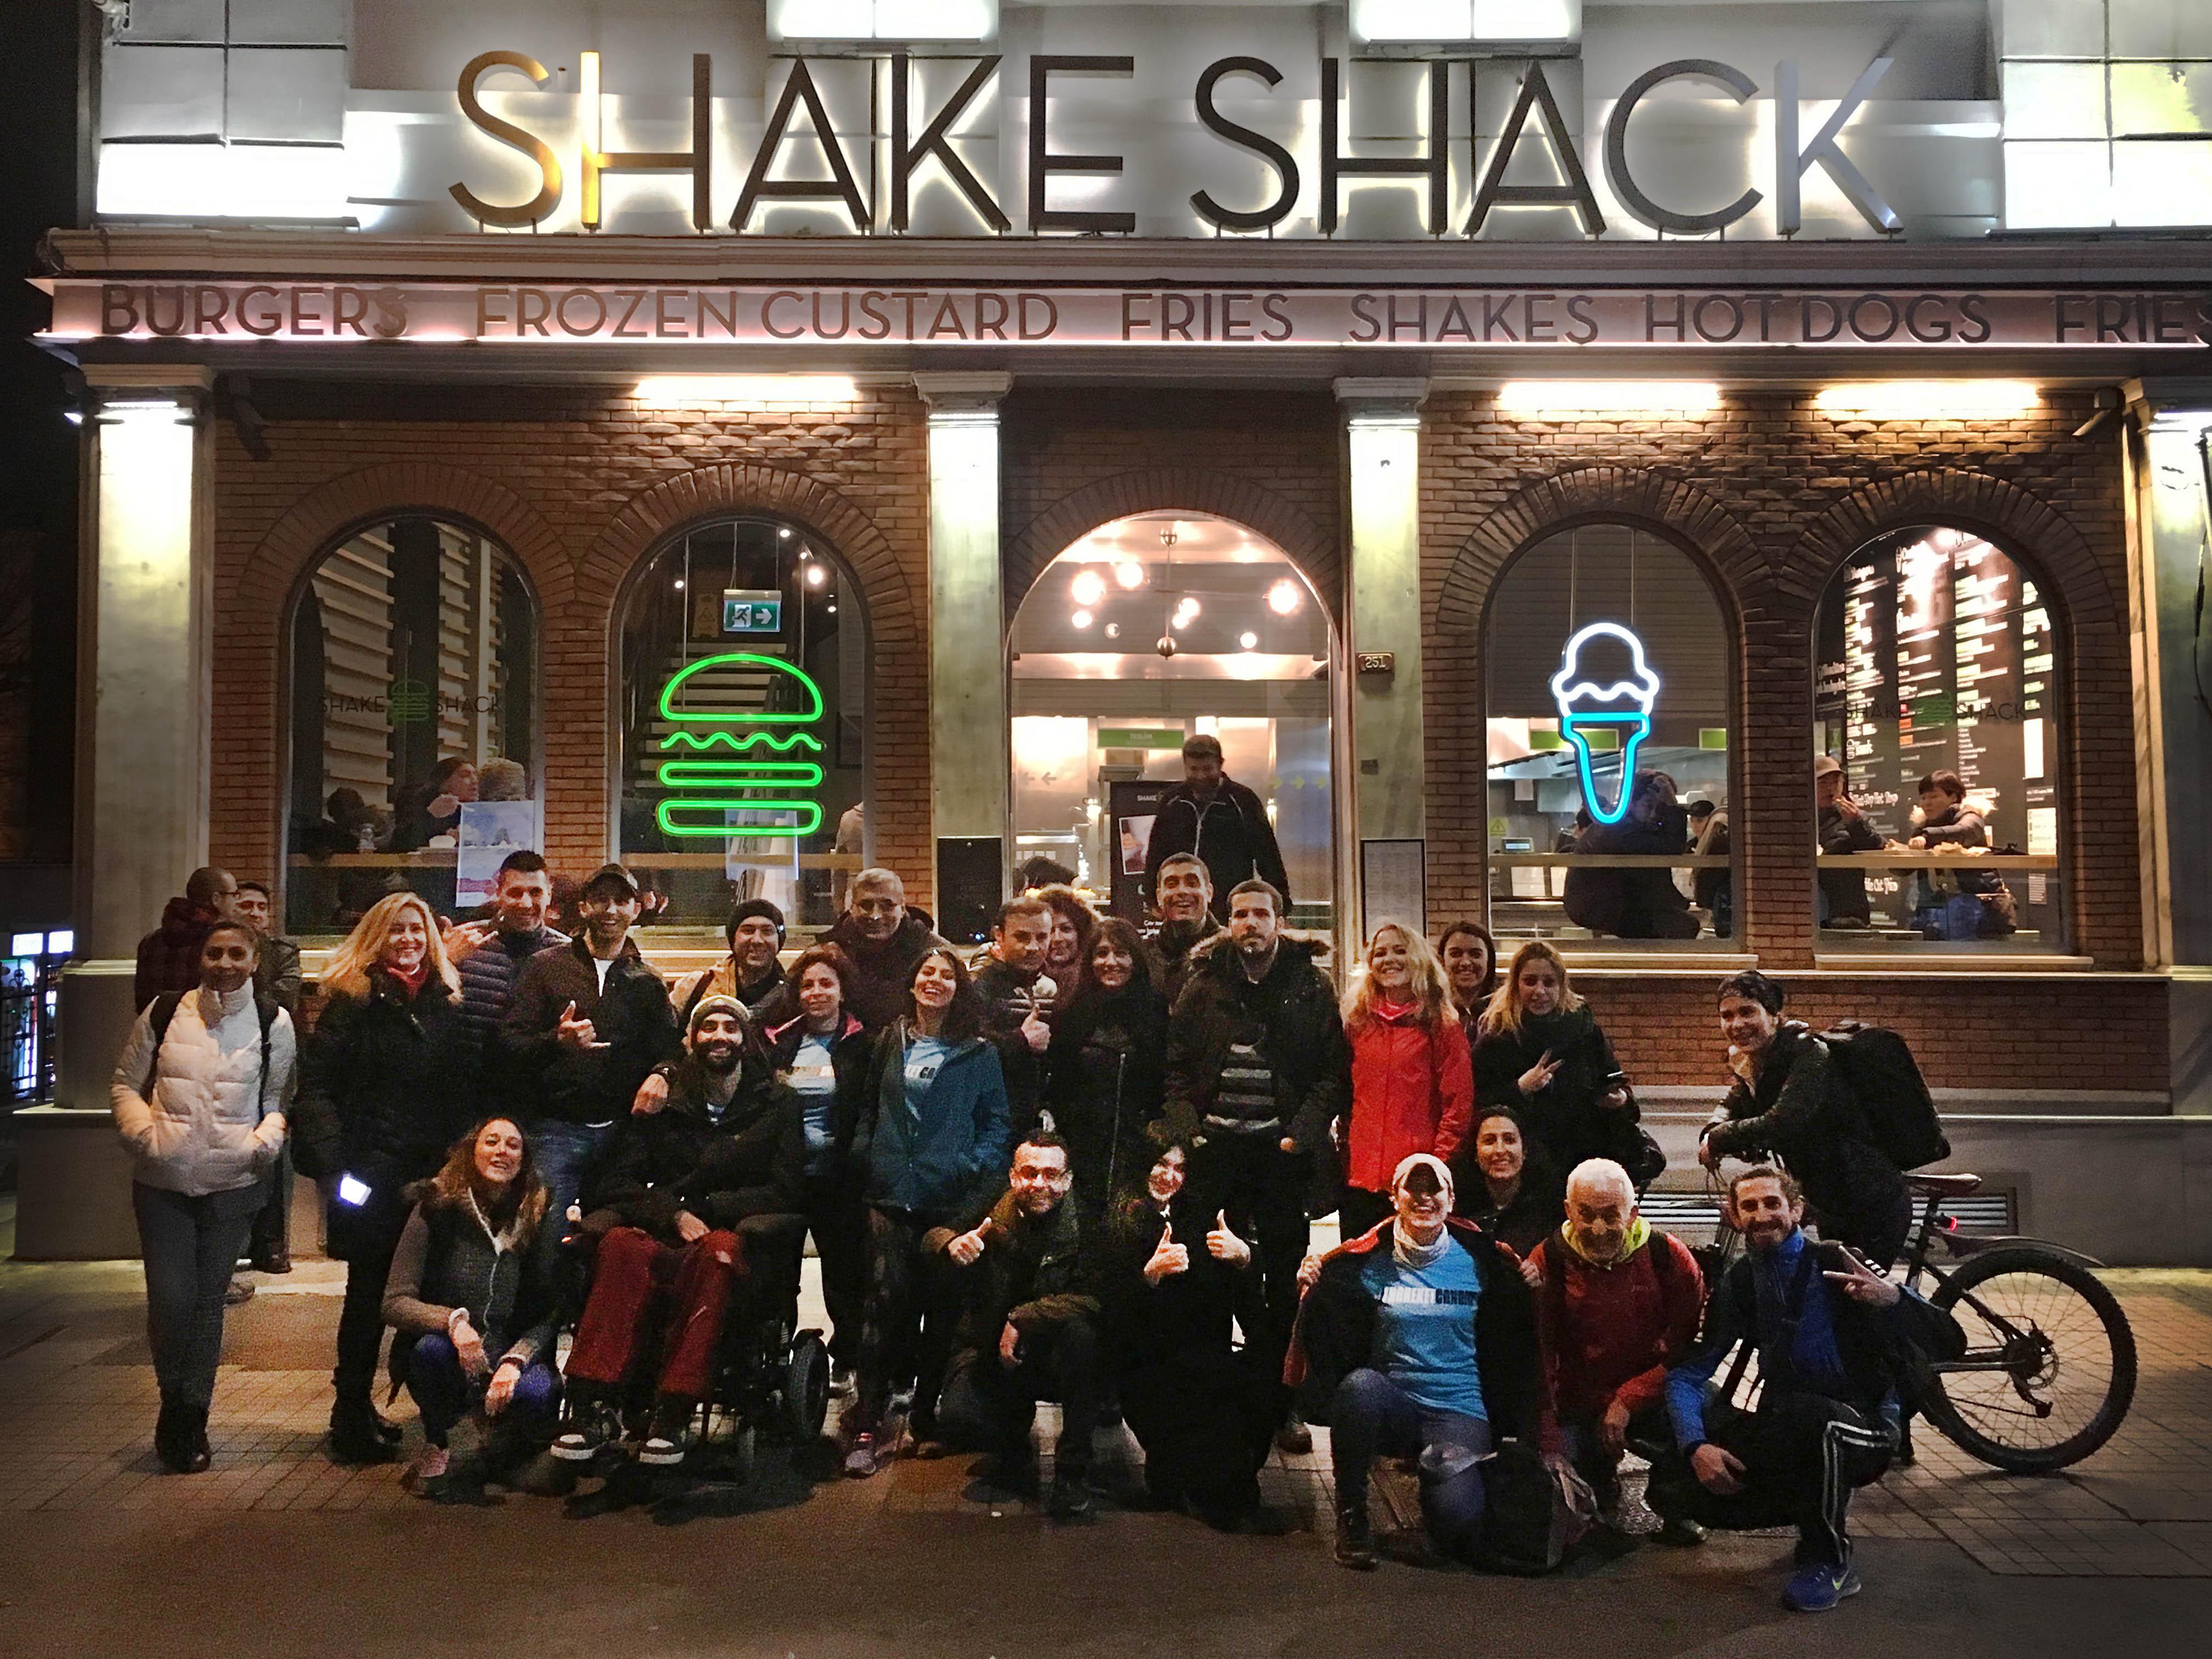 Shake Shack restaurant.